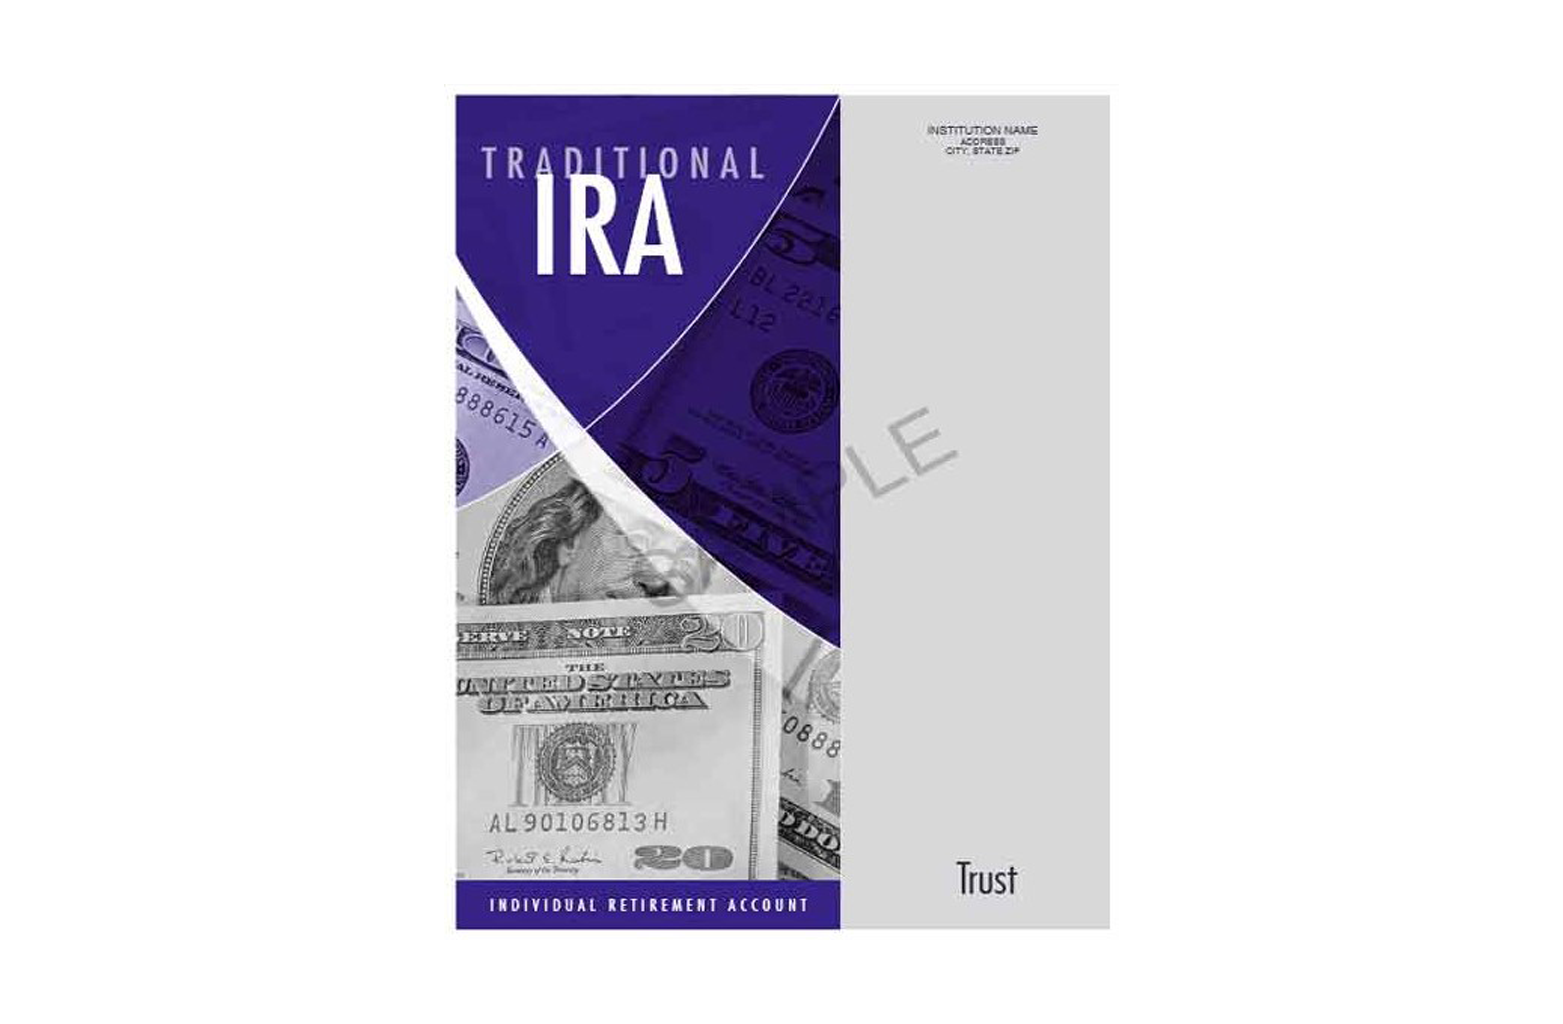 Traditional IRA Organizer - Trust sample